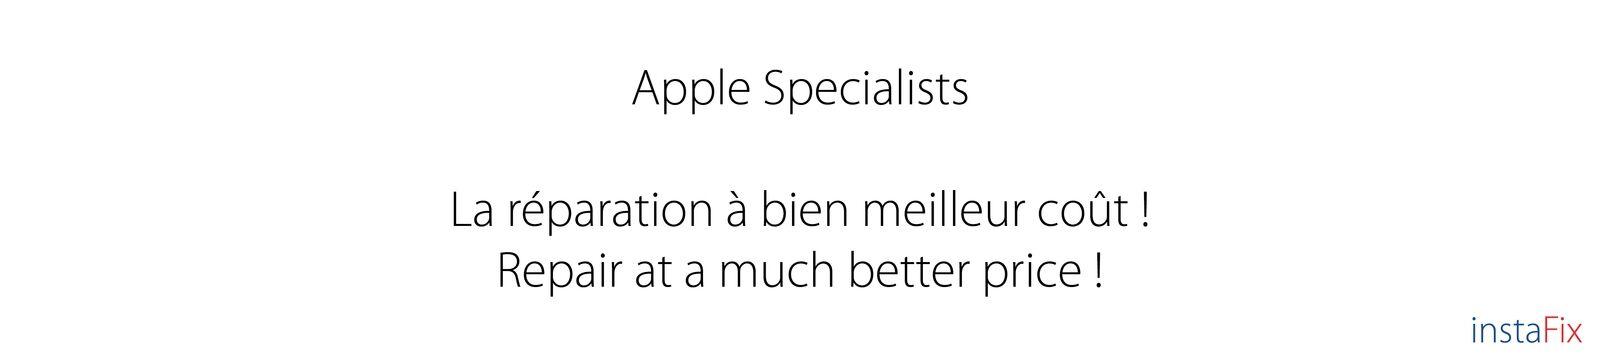 instafix Apple Specialists